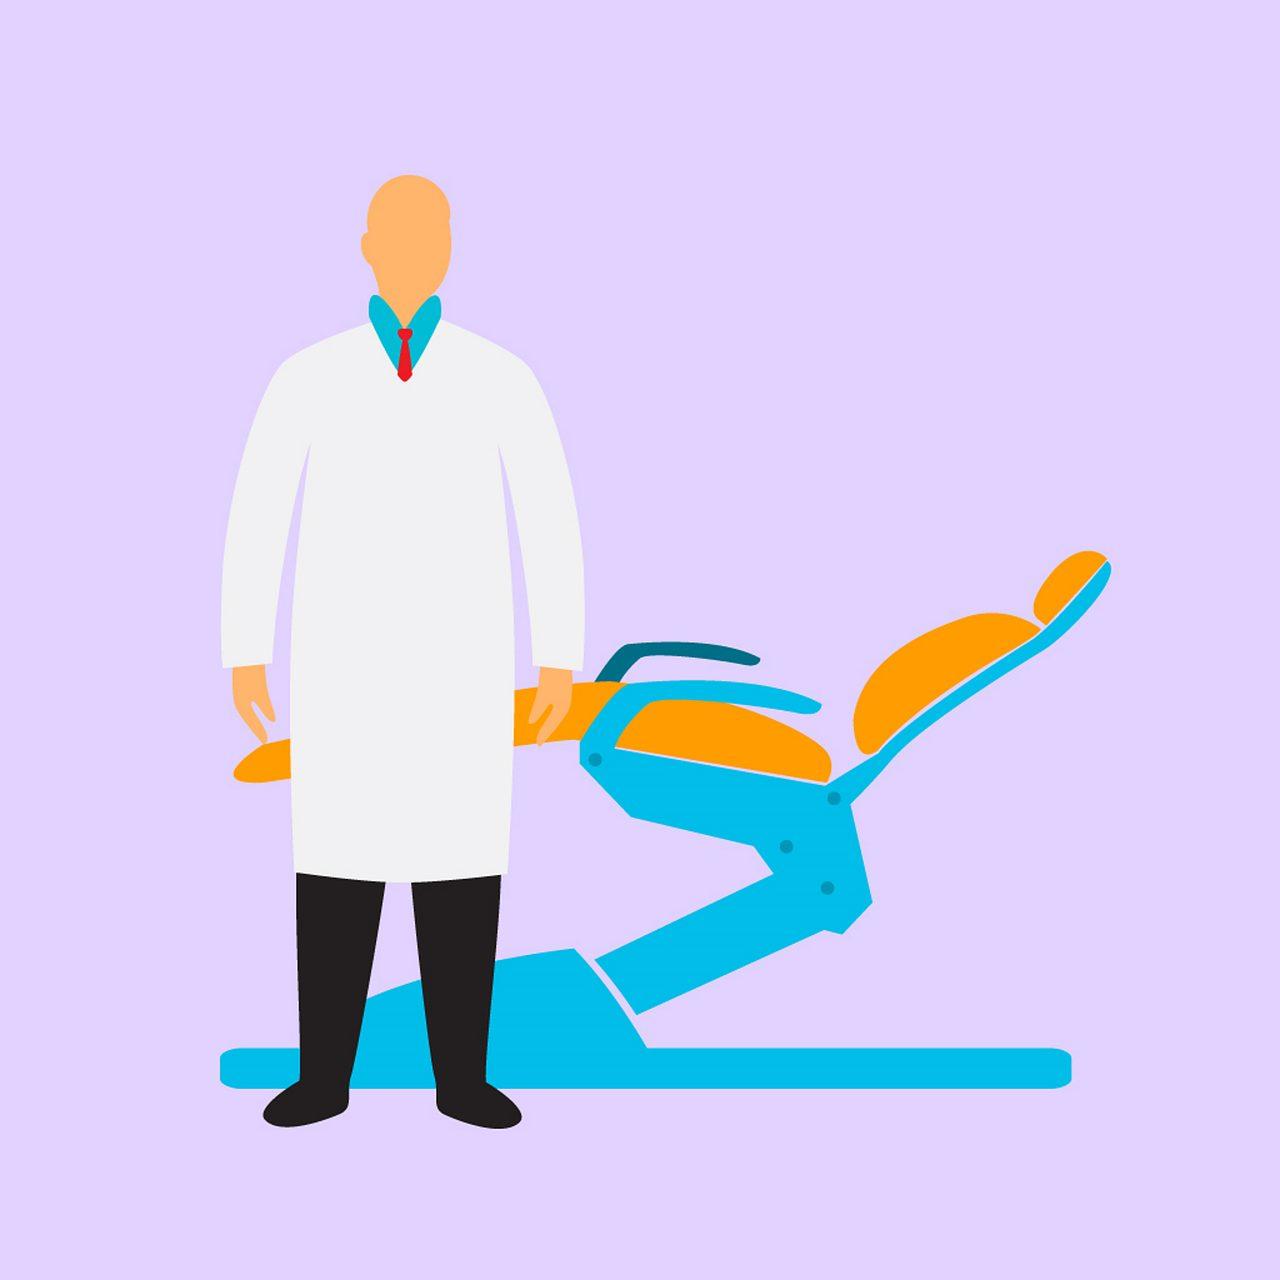 Lamers P W A tandarts spoed